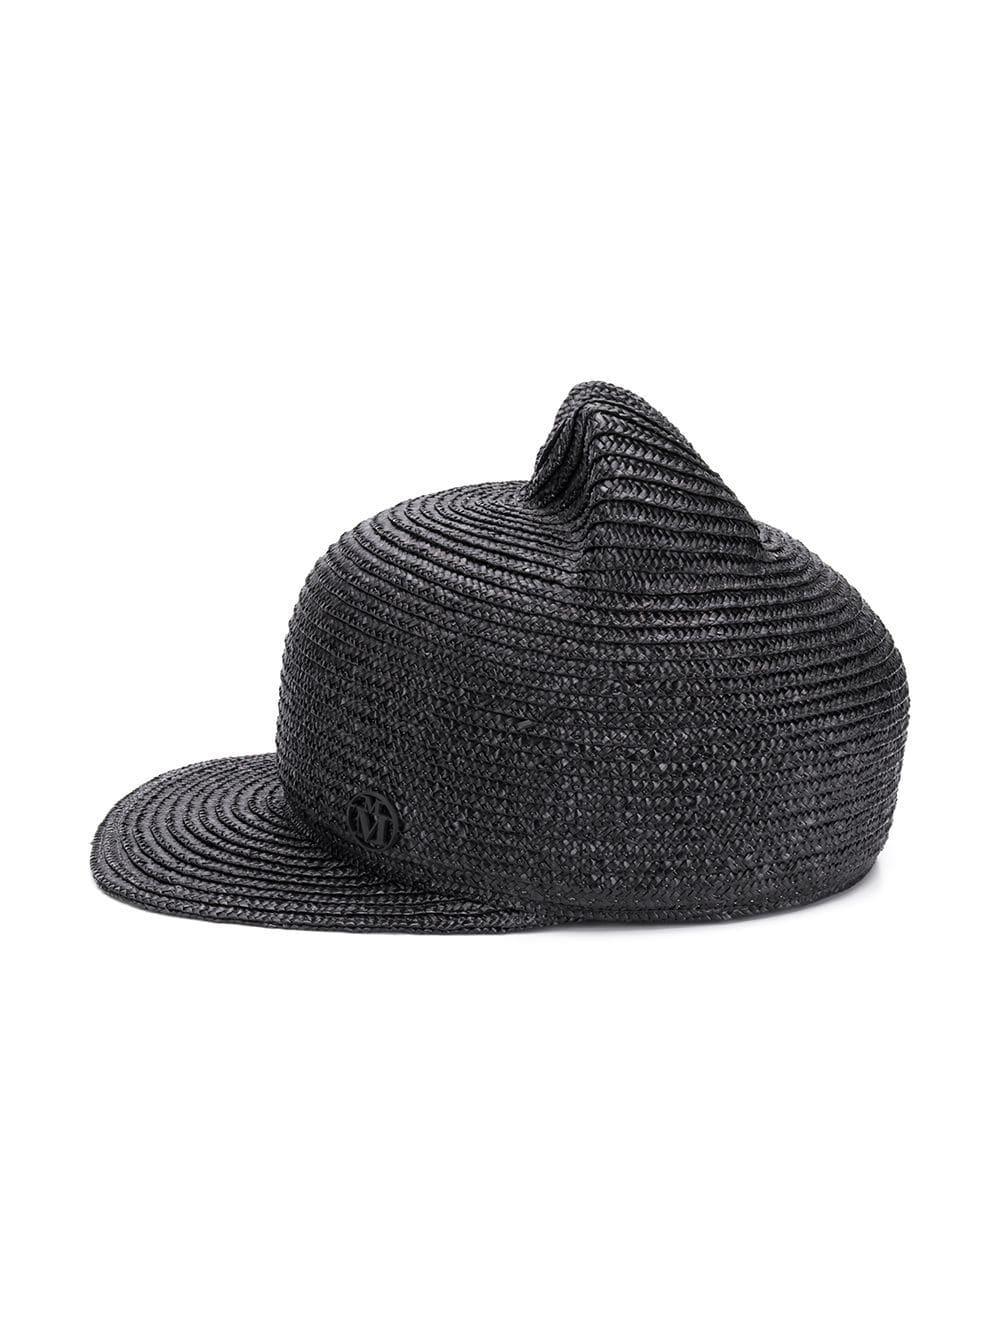 Gorras - Gorros y Sombreros Maison Michel  4a2f6c371a2